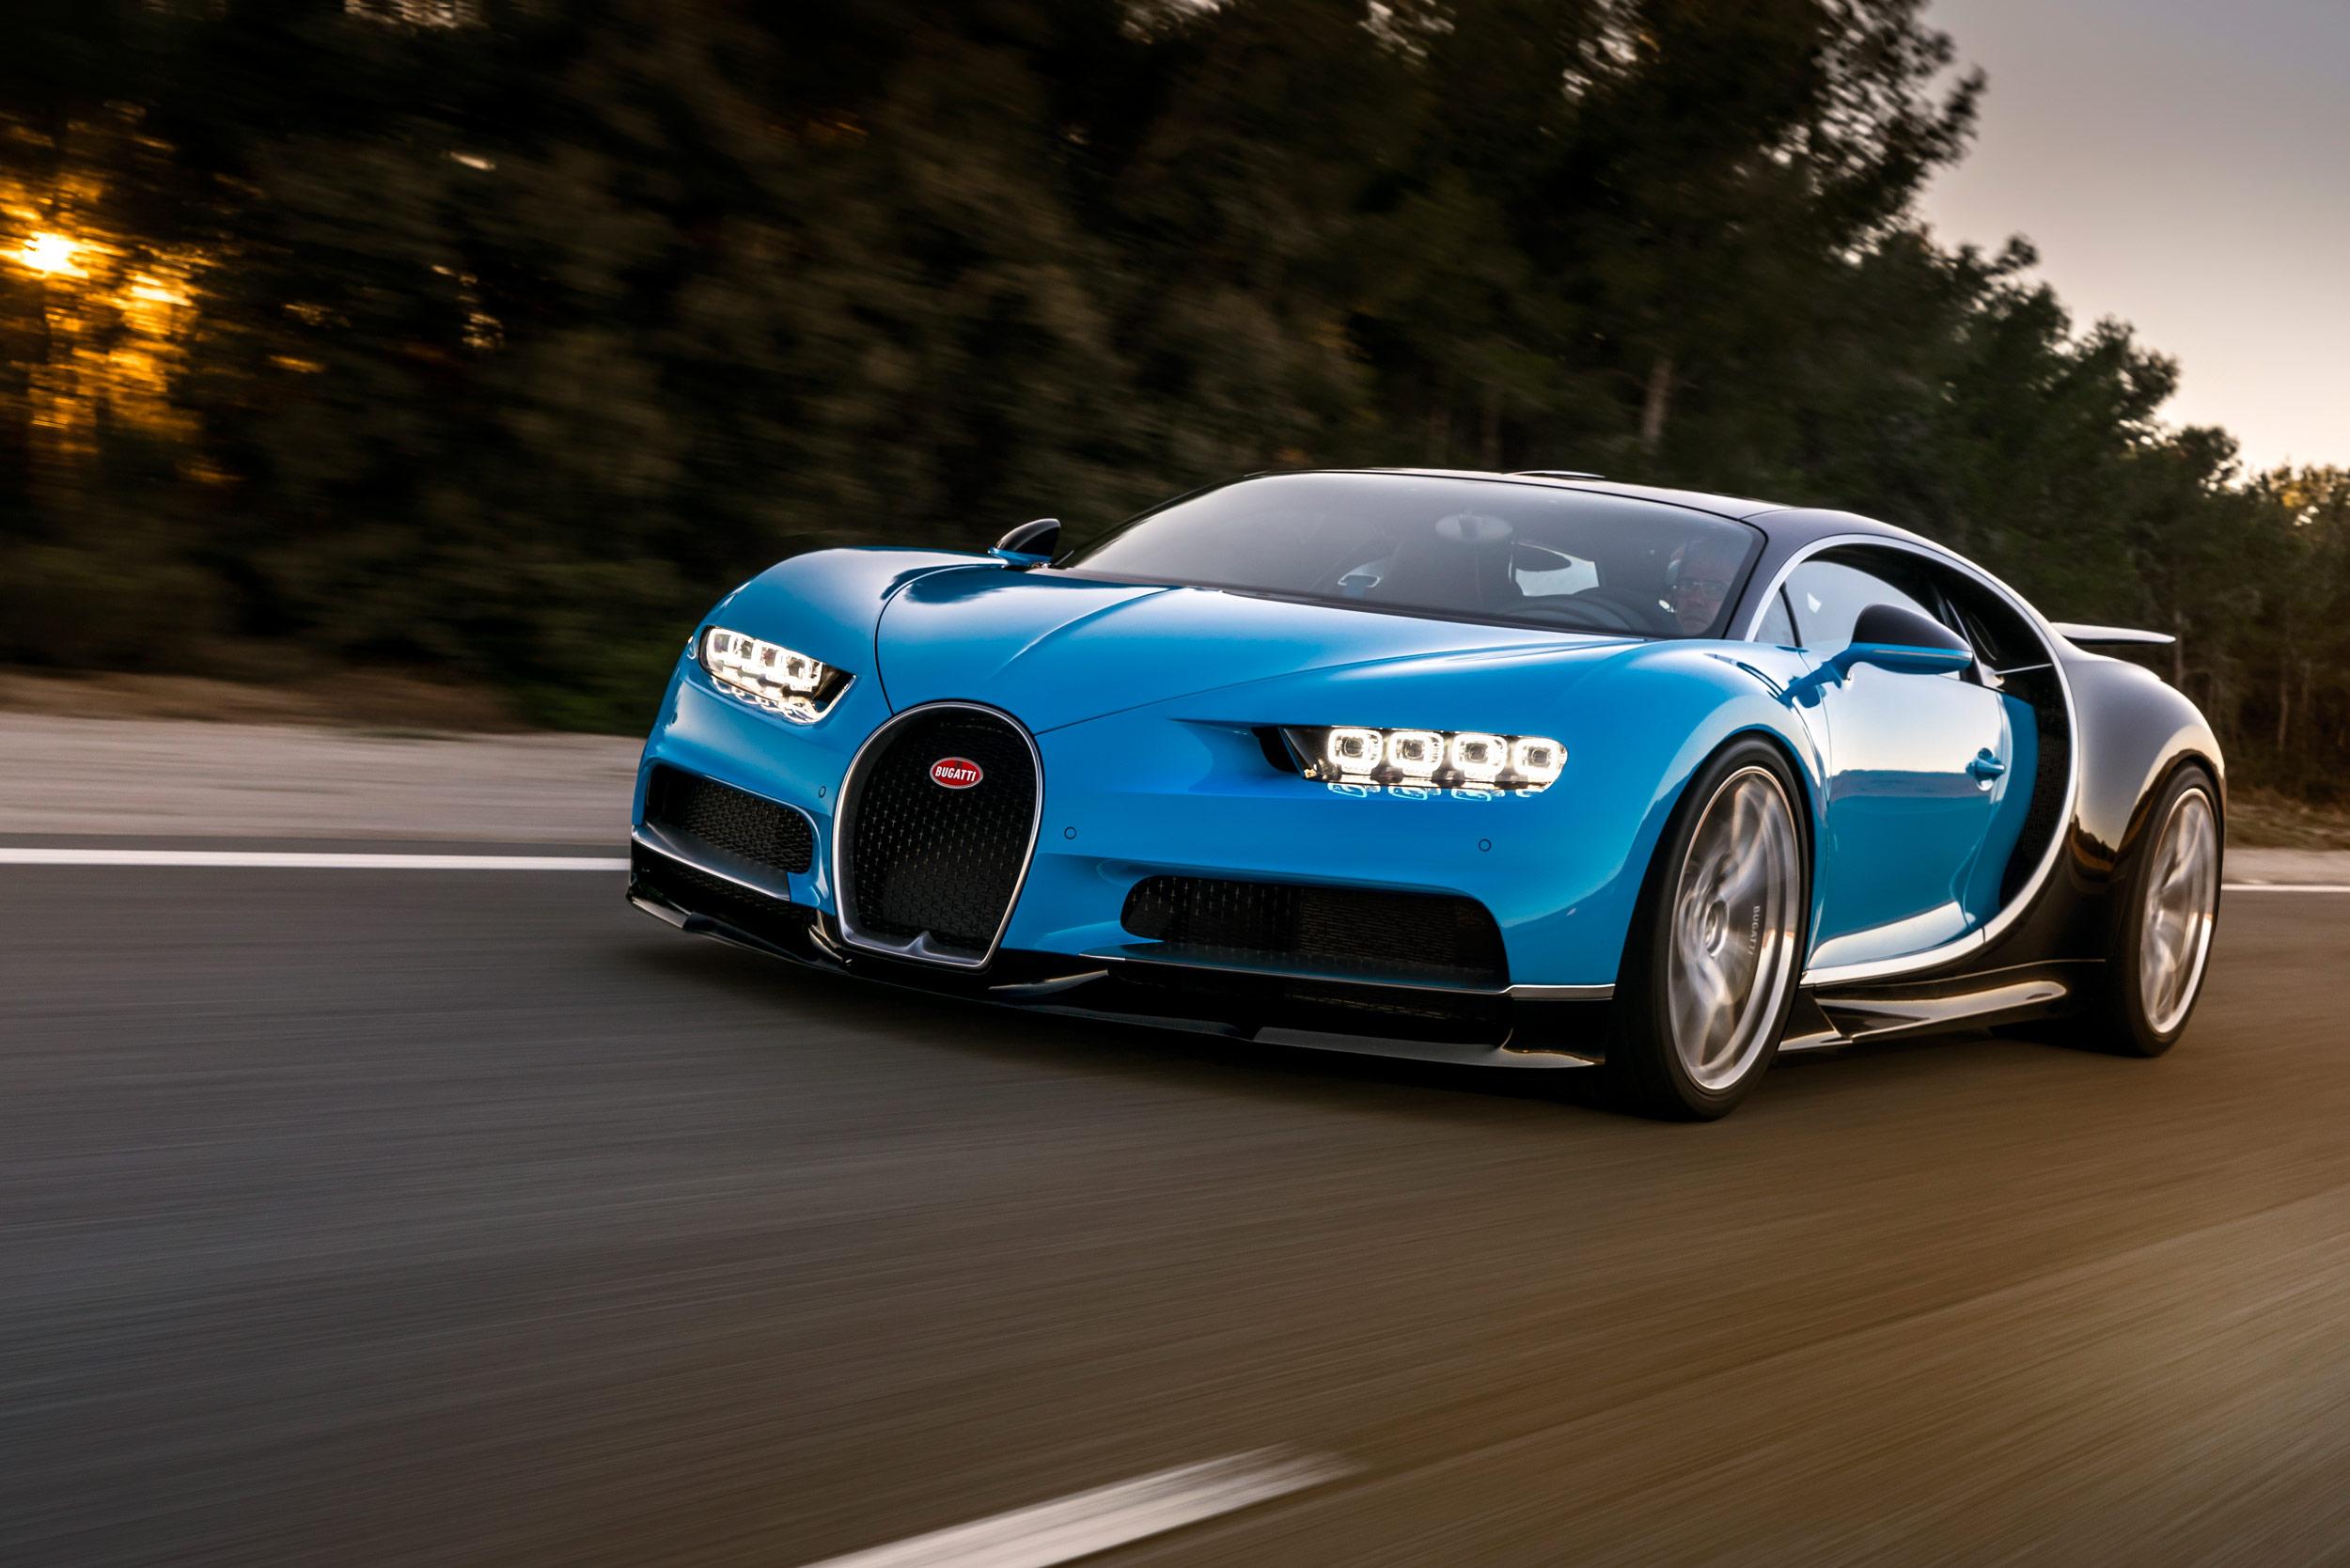 Ginebra 2016: El Bugatti Chiron 2017 llega con 1500 HP bajo el capó ...